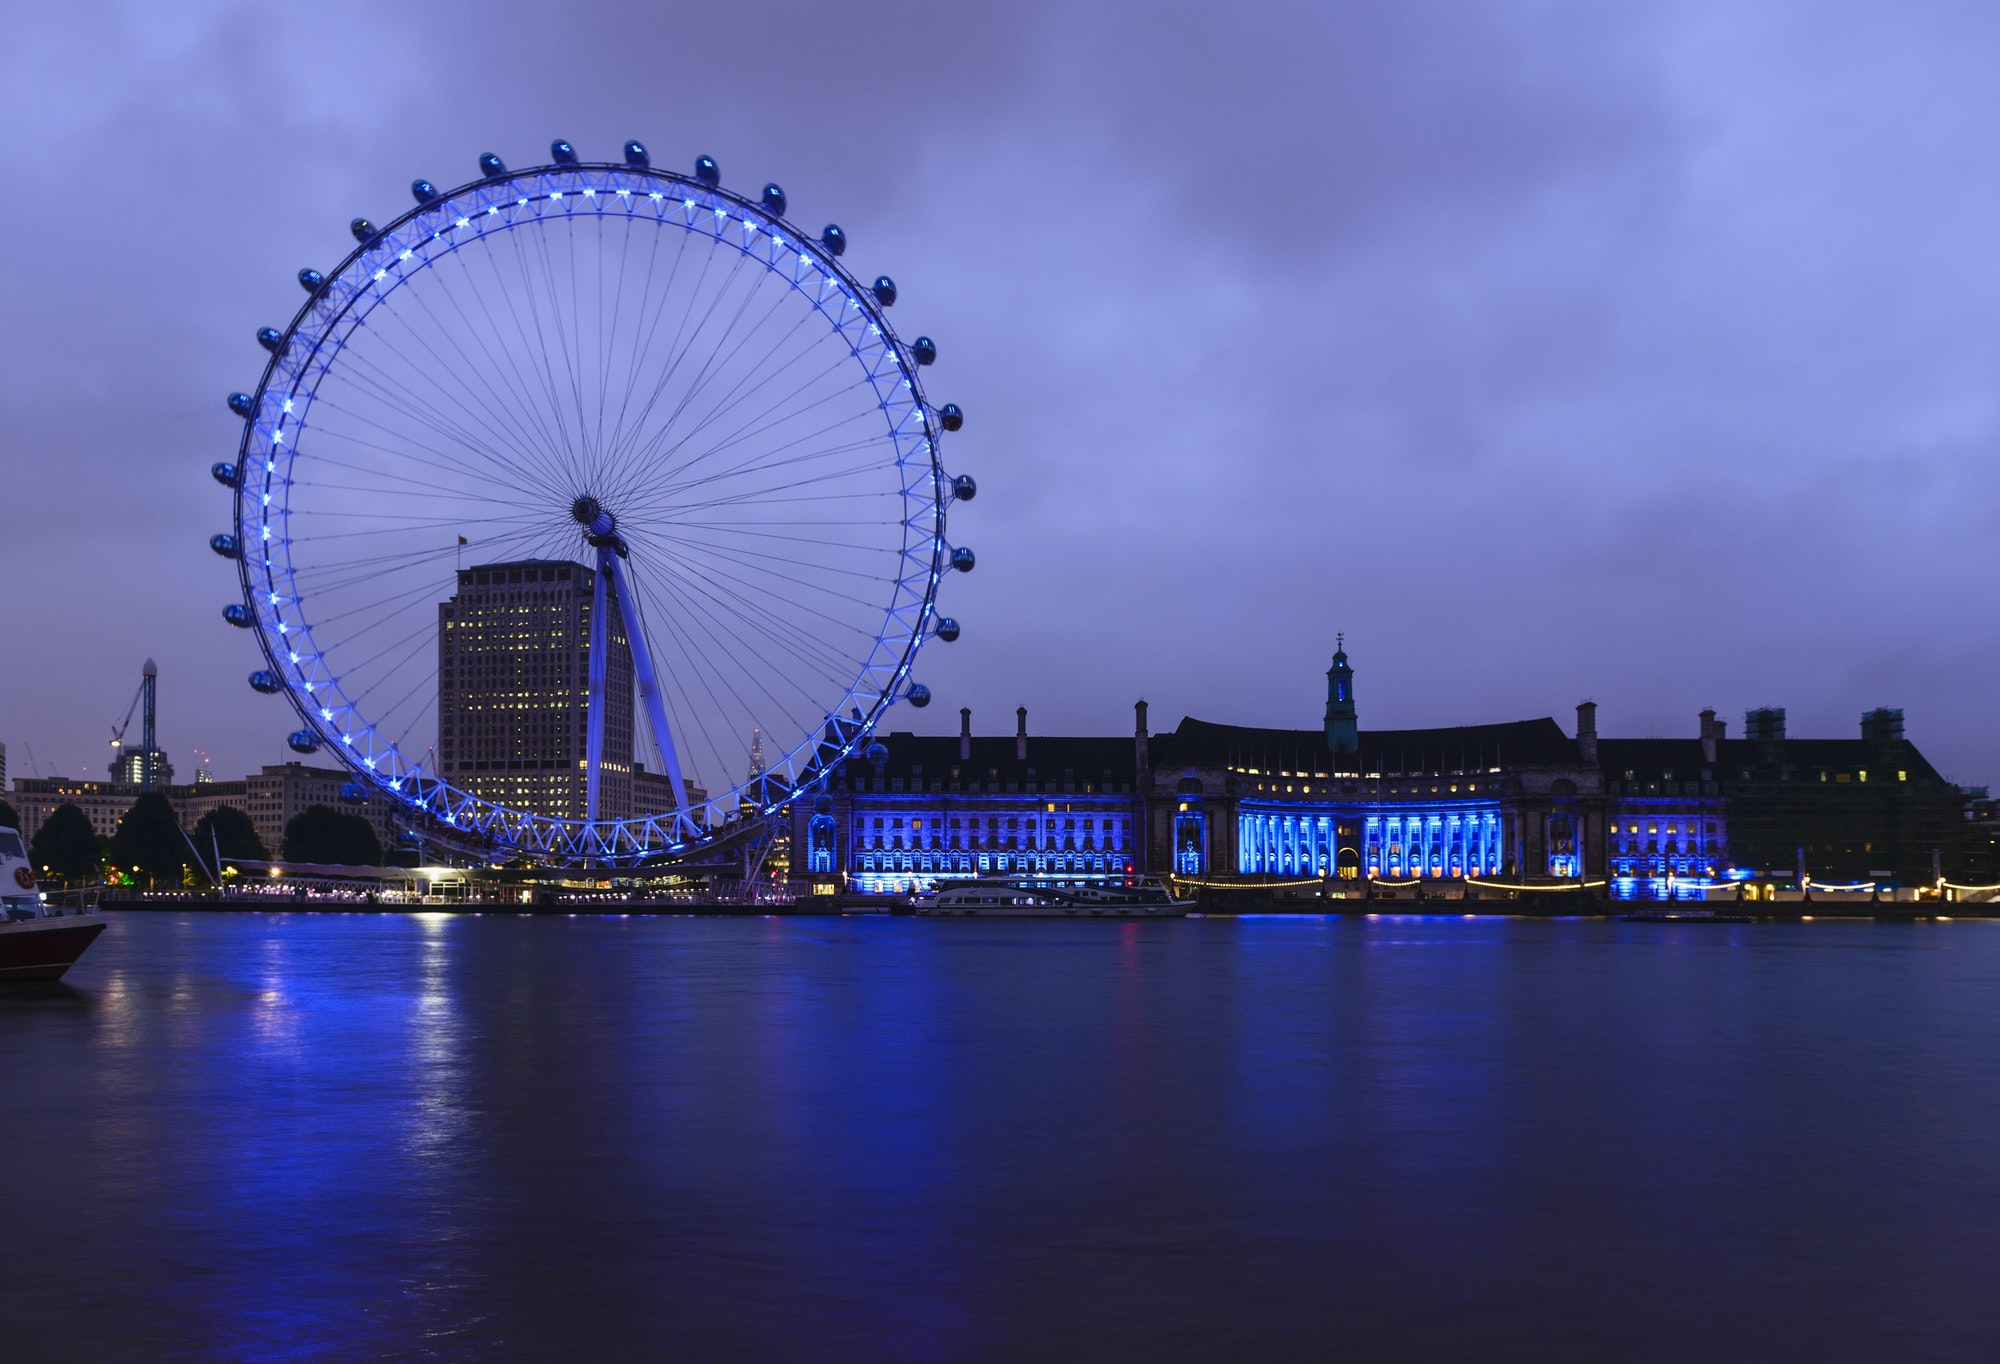 54877,London Eye and waterfront lit up at night, London, United Kingdom